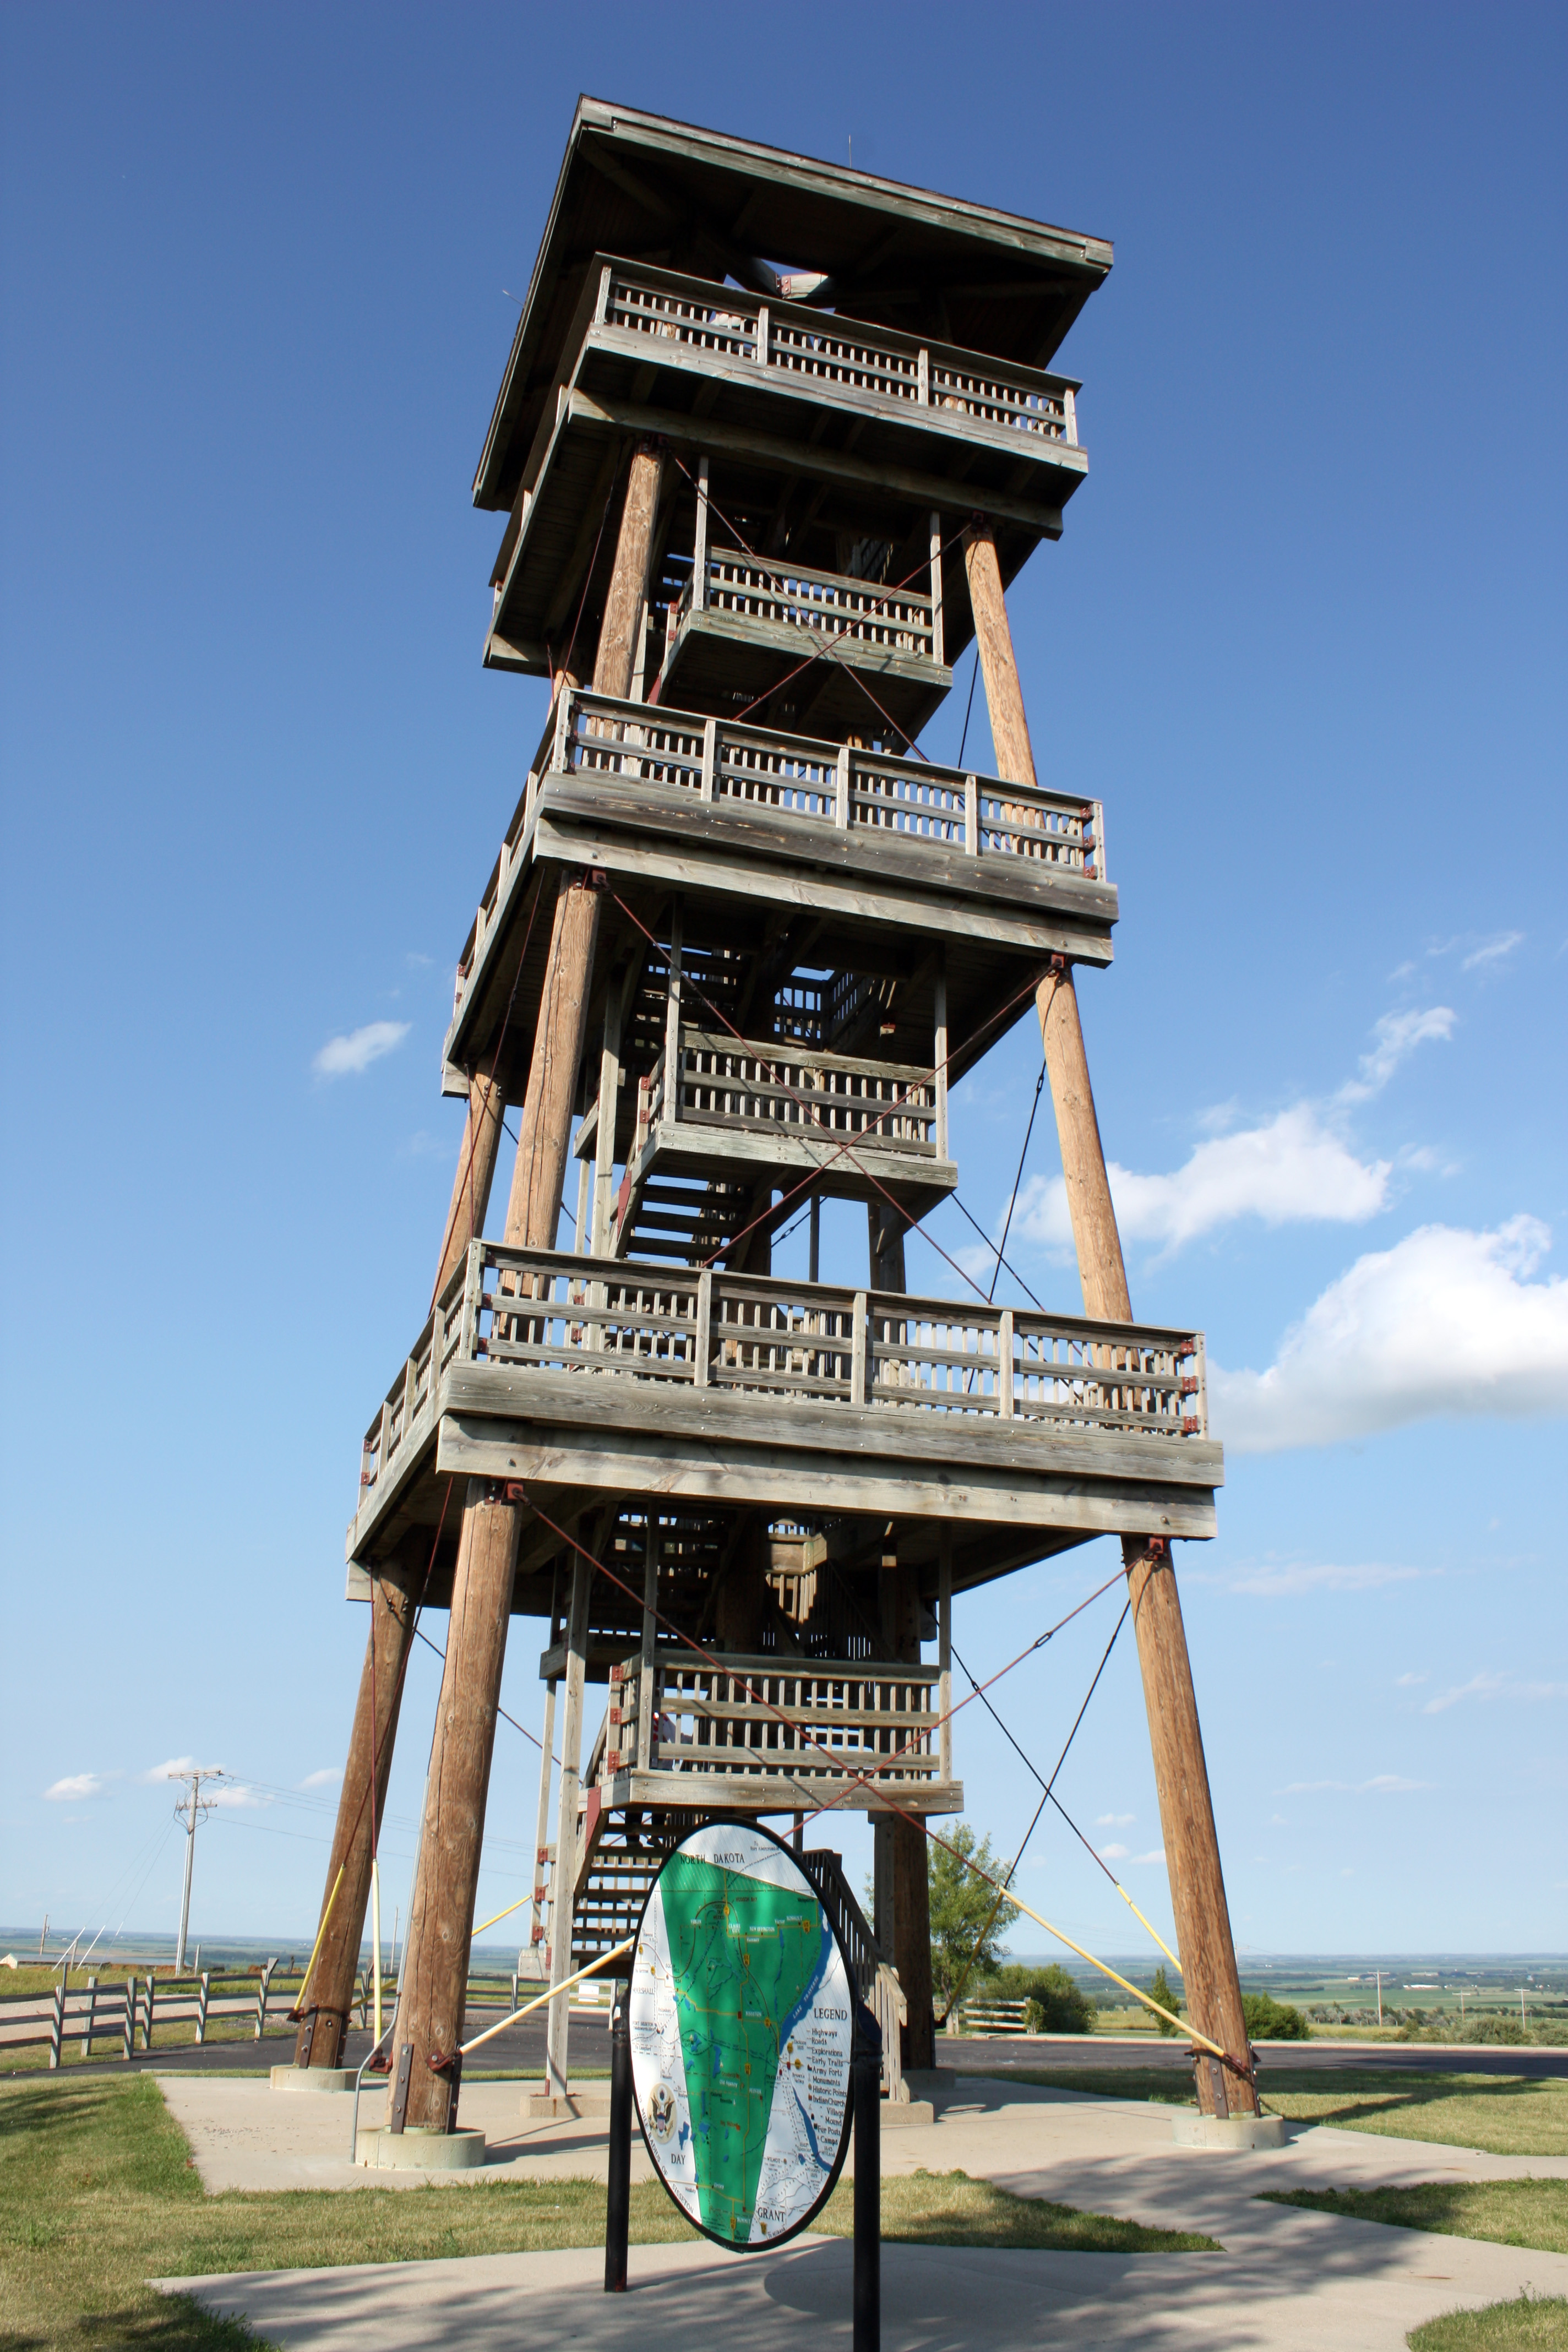 http://upload.wikimedia.org/wikipedia/commons/2/22/Nicollet_Tower_Sisseton,_SD.jpg